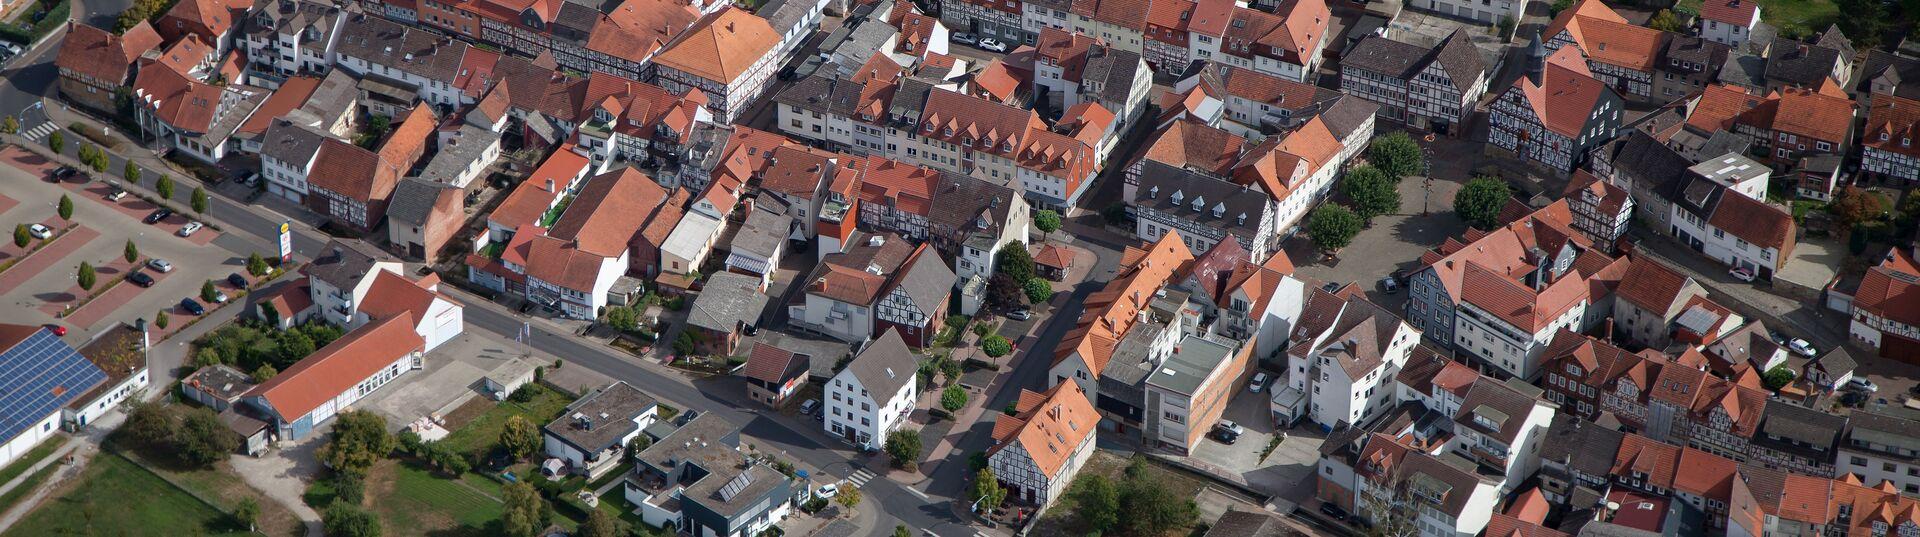 Sontra_Innenstadt